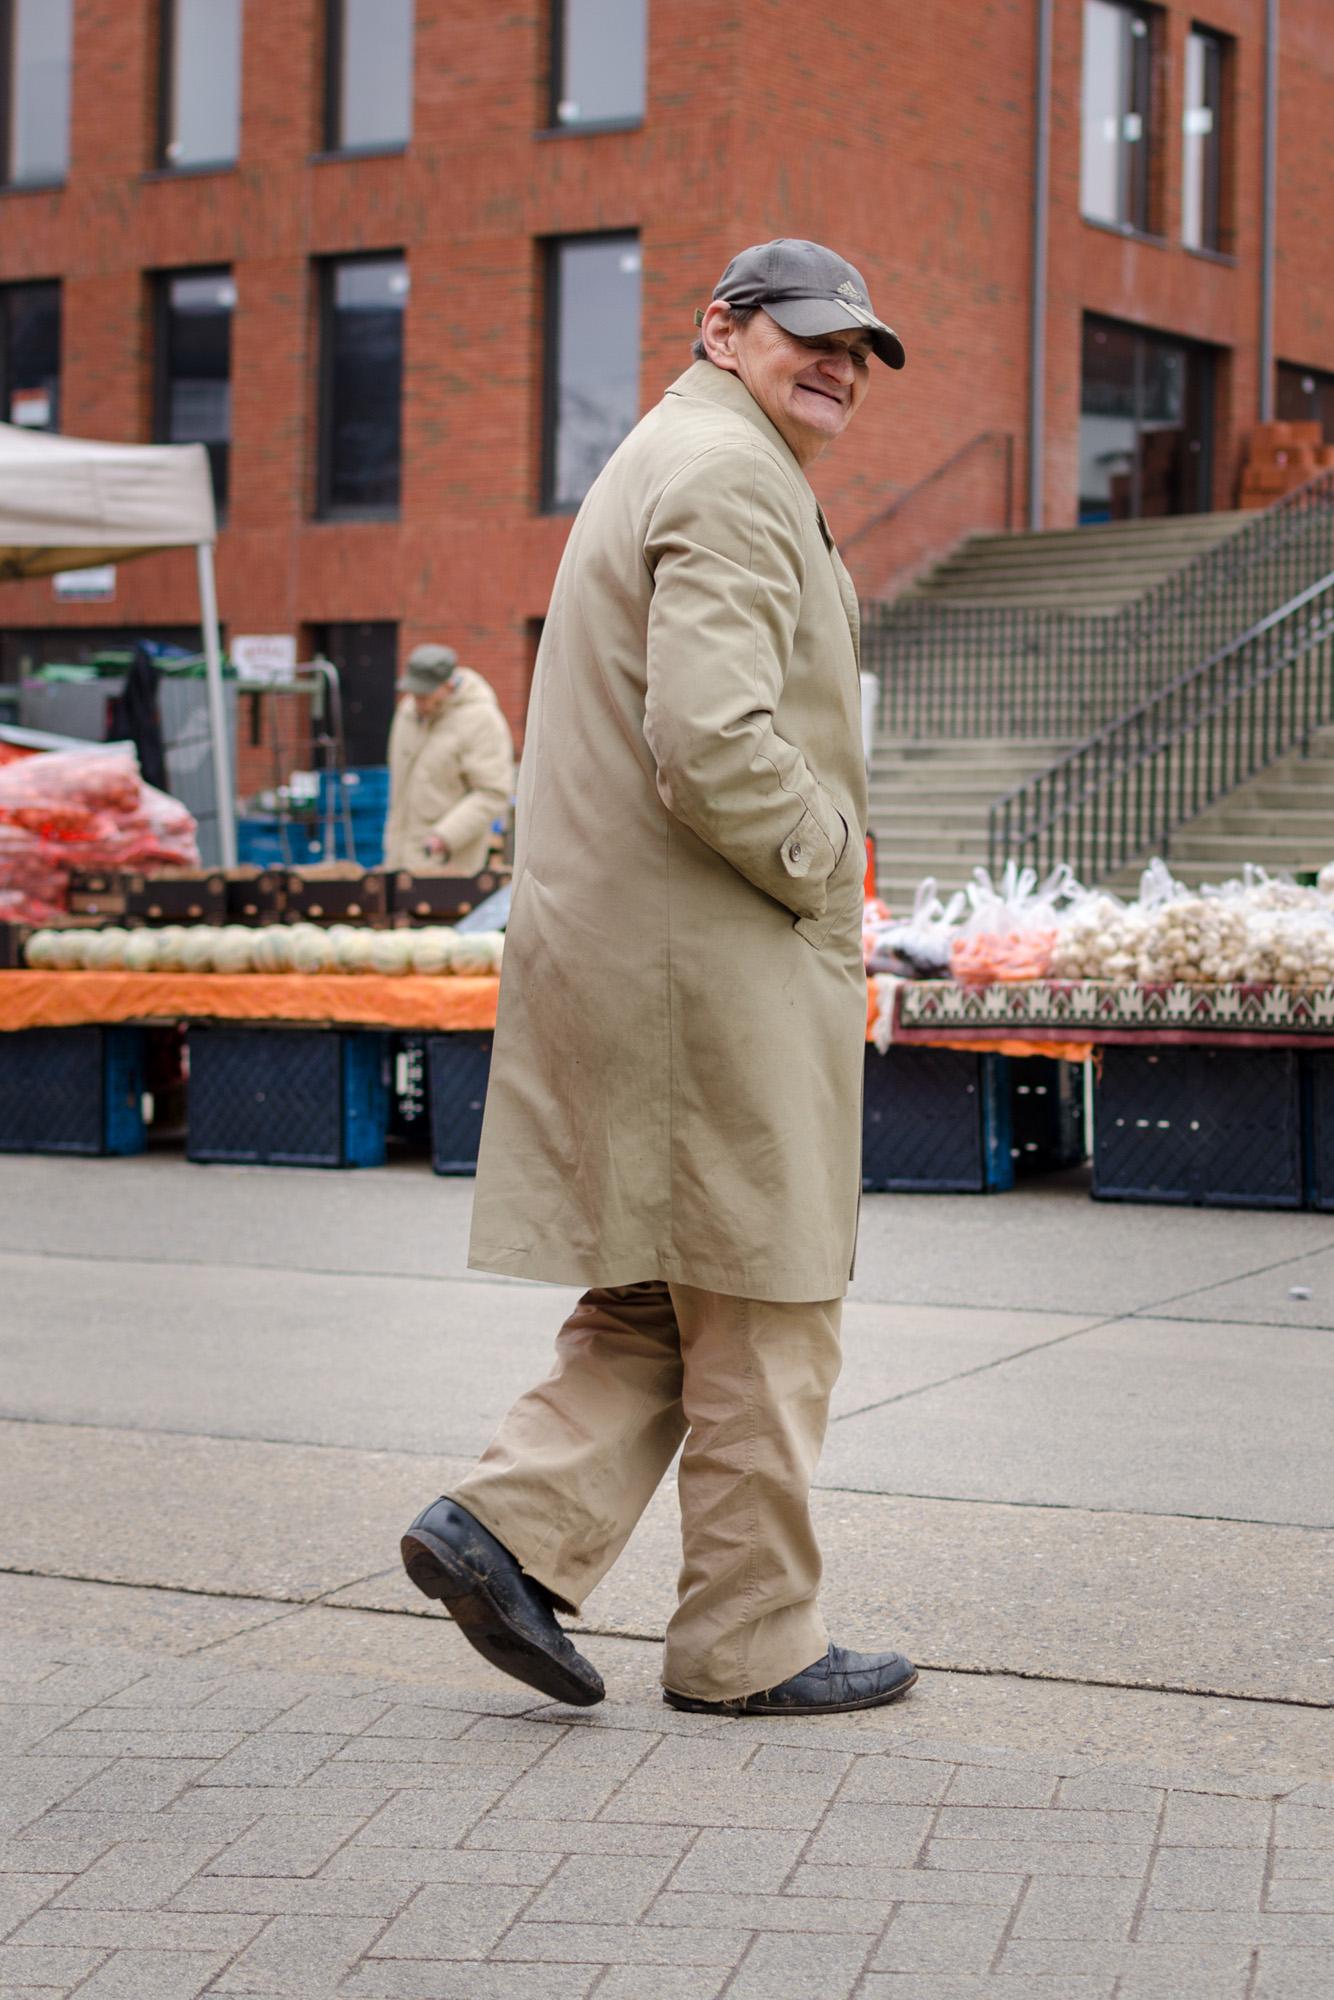 Man in stofjas 4 - straatfotografie :: foto-rv